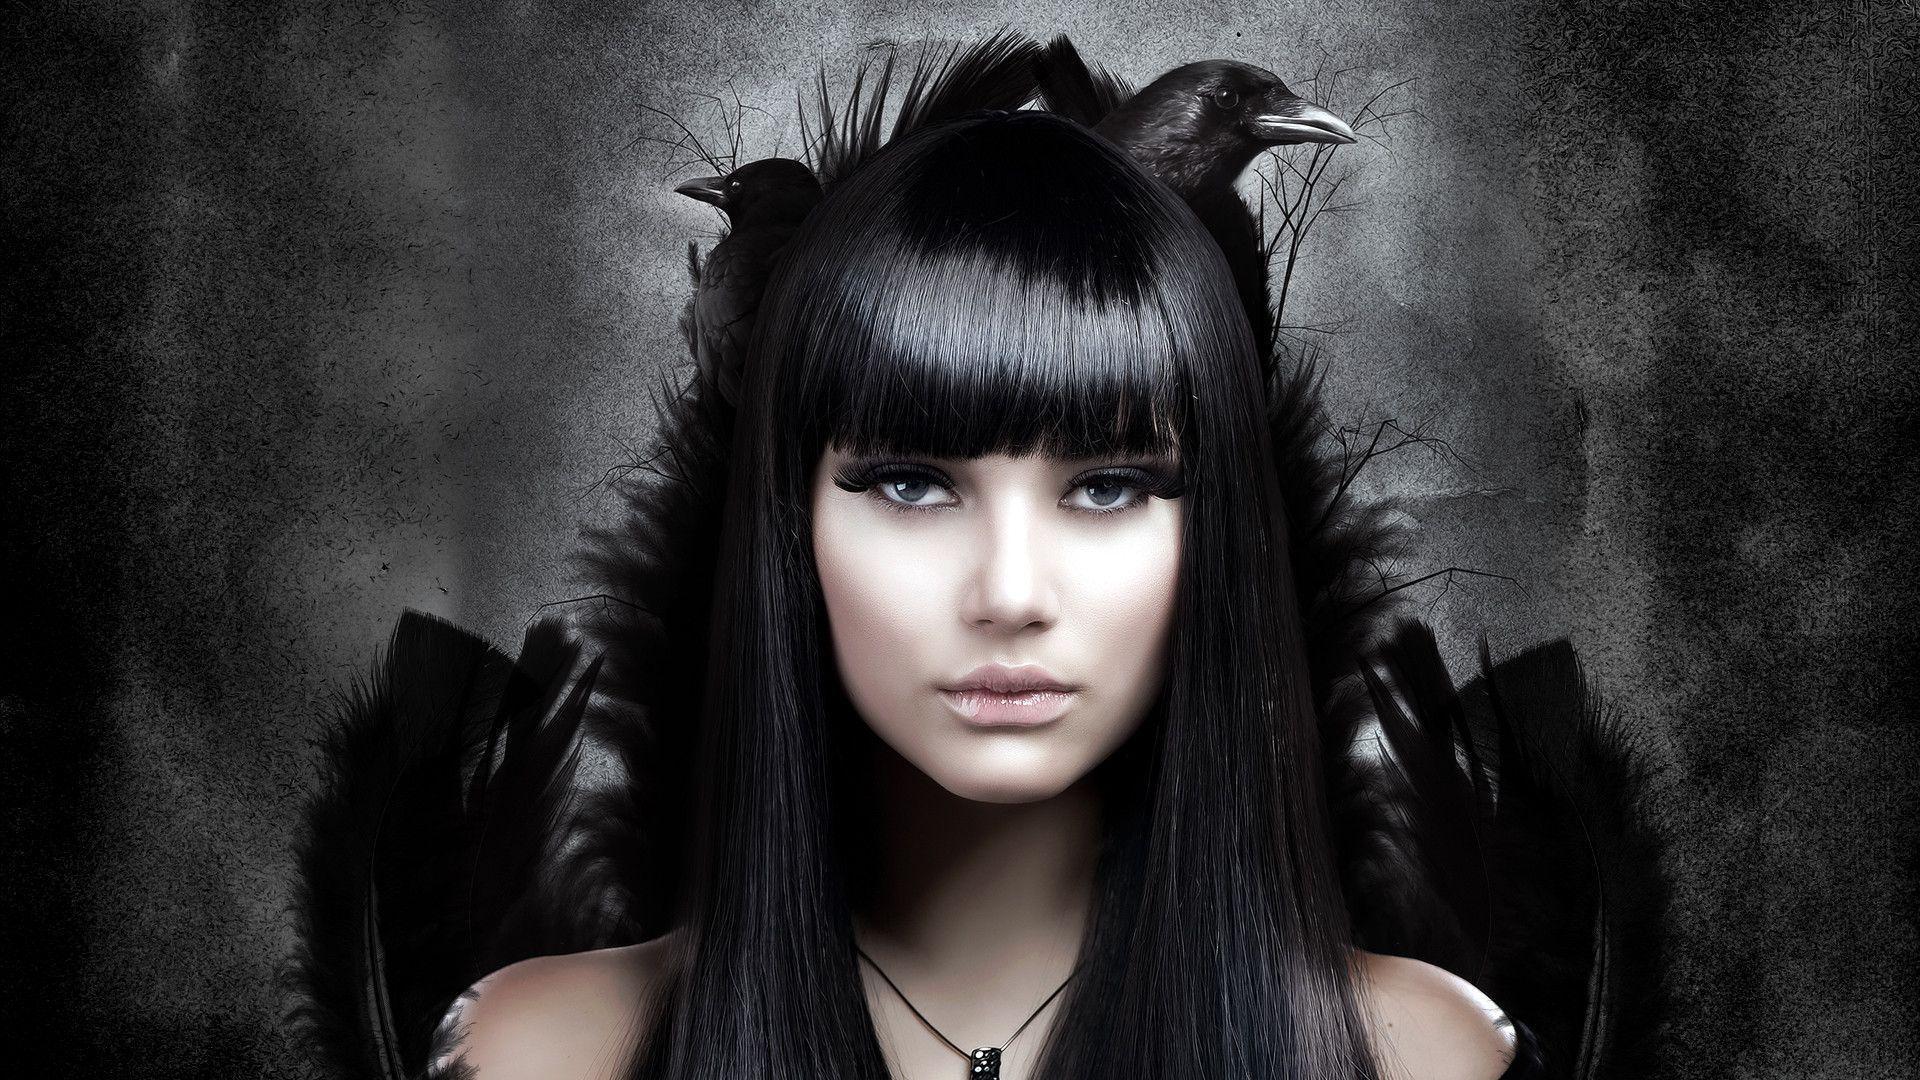 Gothic Vampire Backgrounds Gothic Vampire Wallpap...